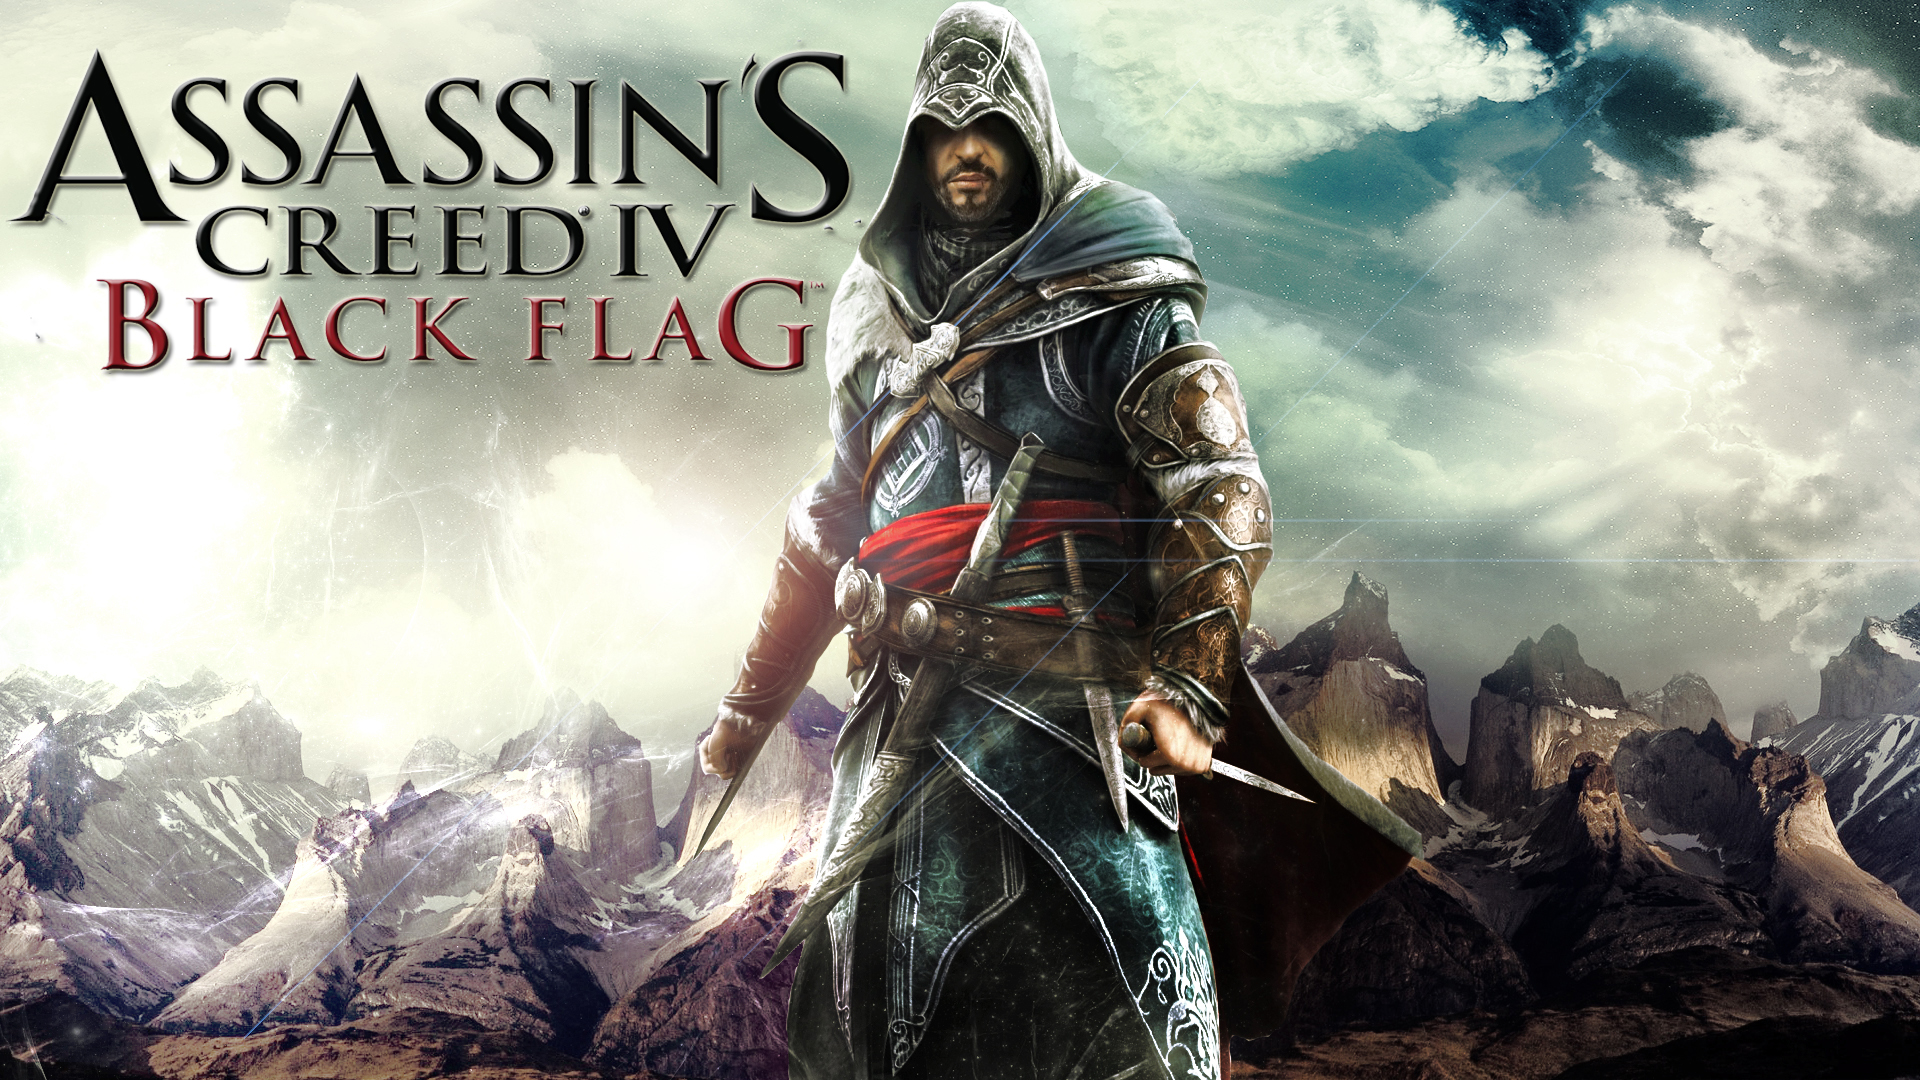 49 Assassin S Creed 4 Wallpaper On Wallpapersafari